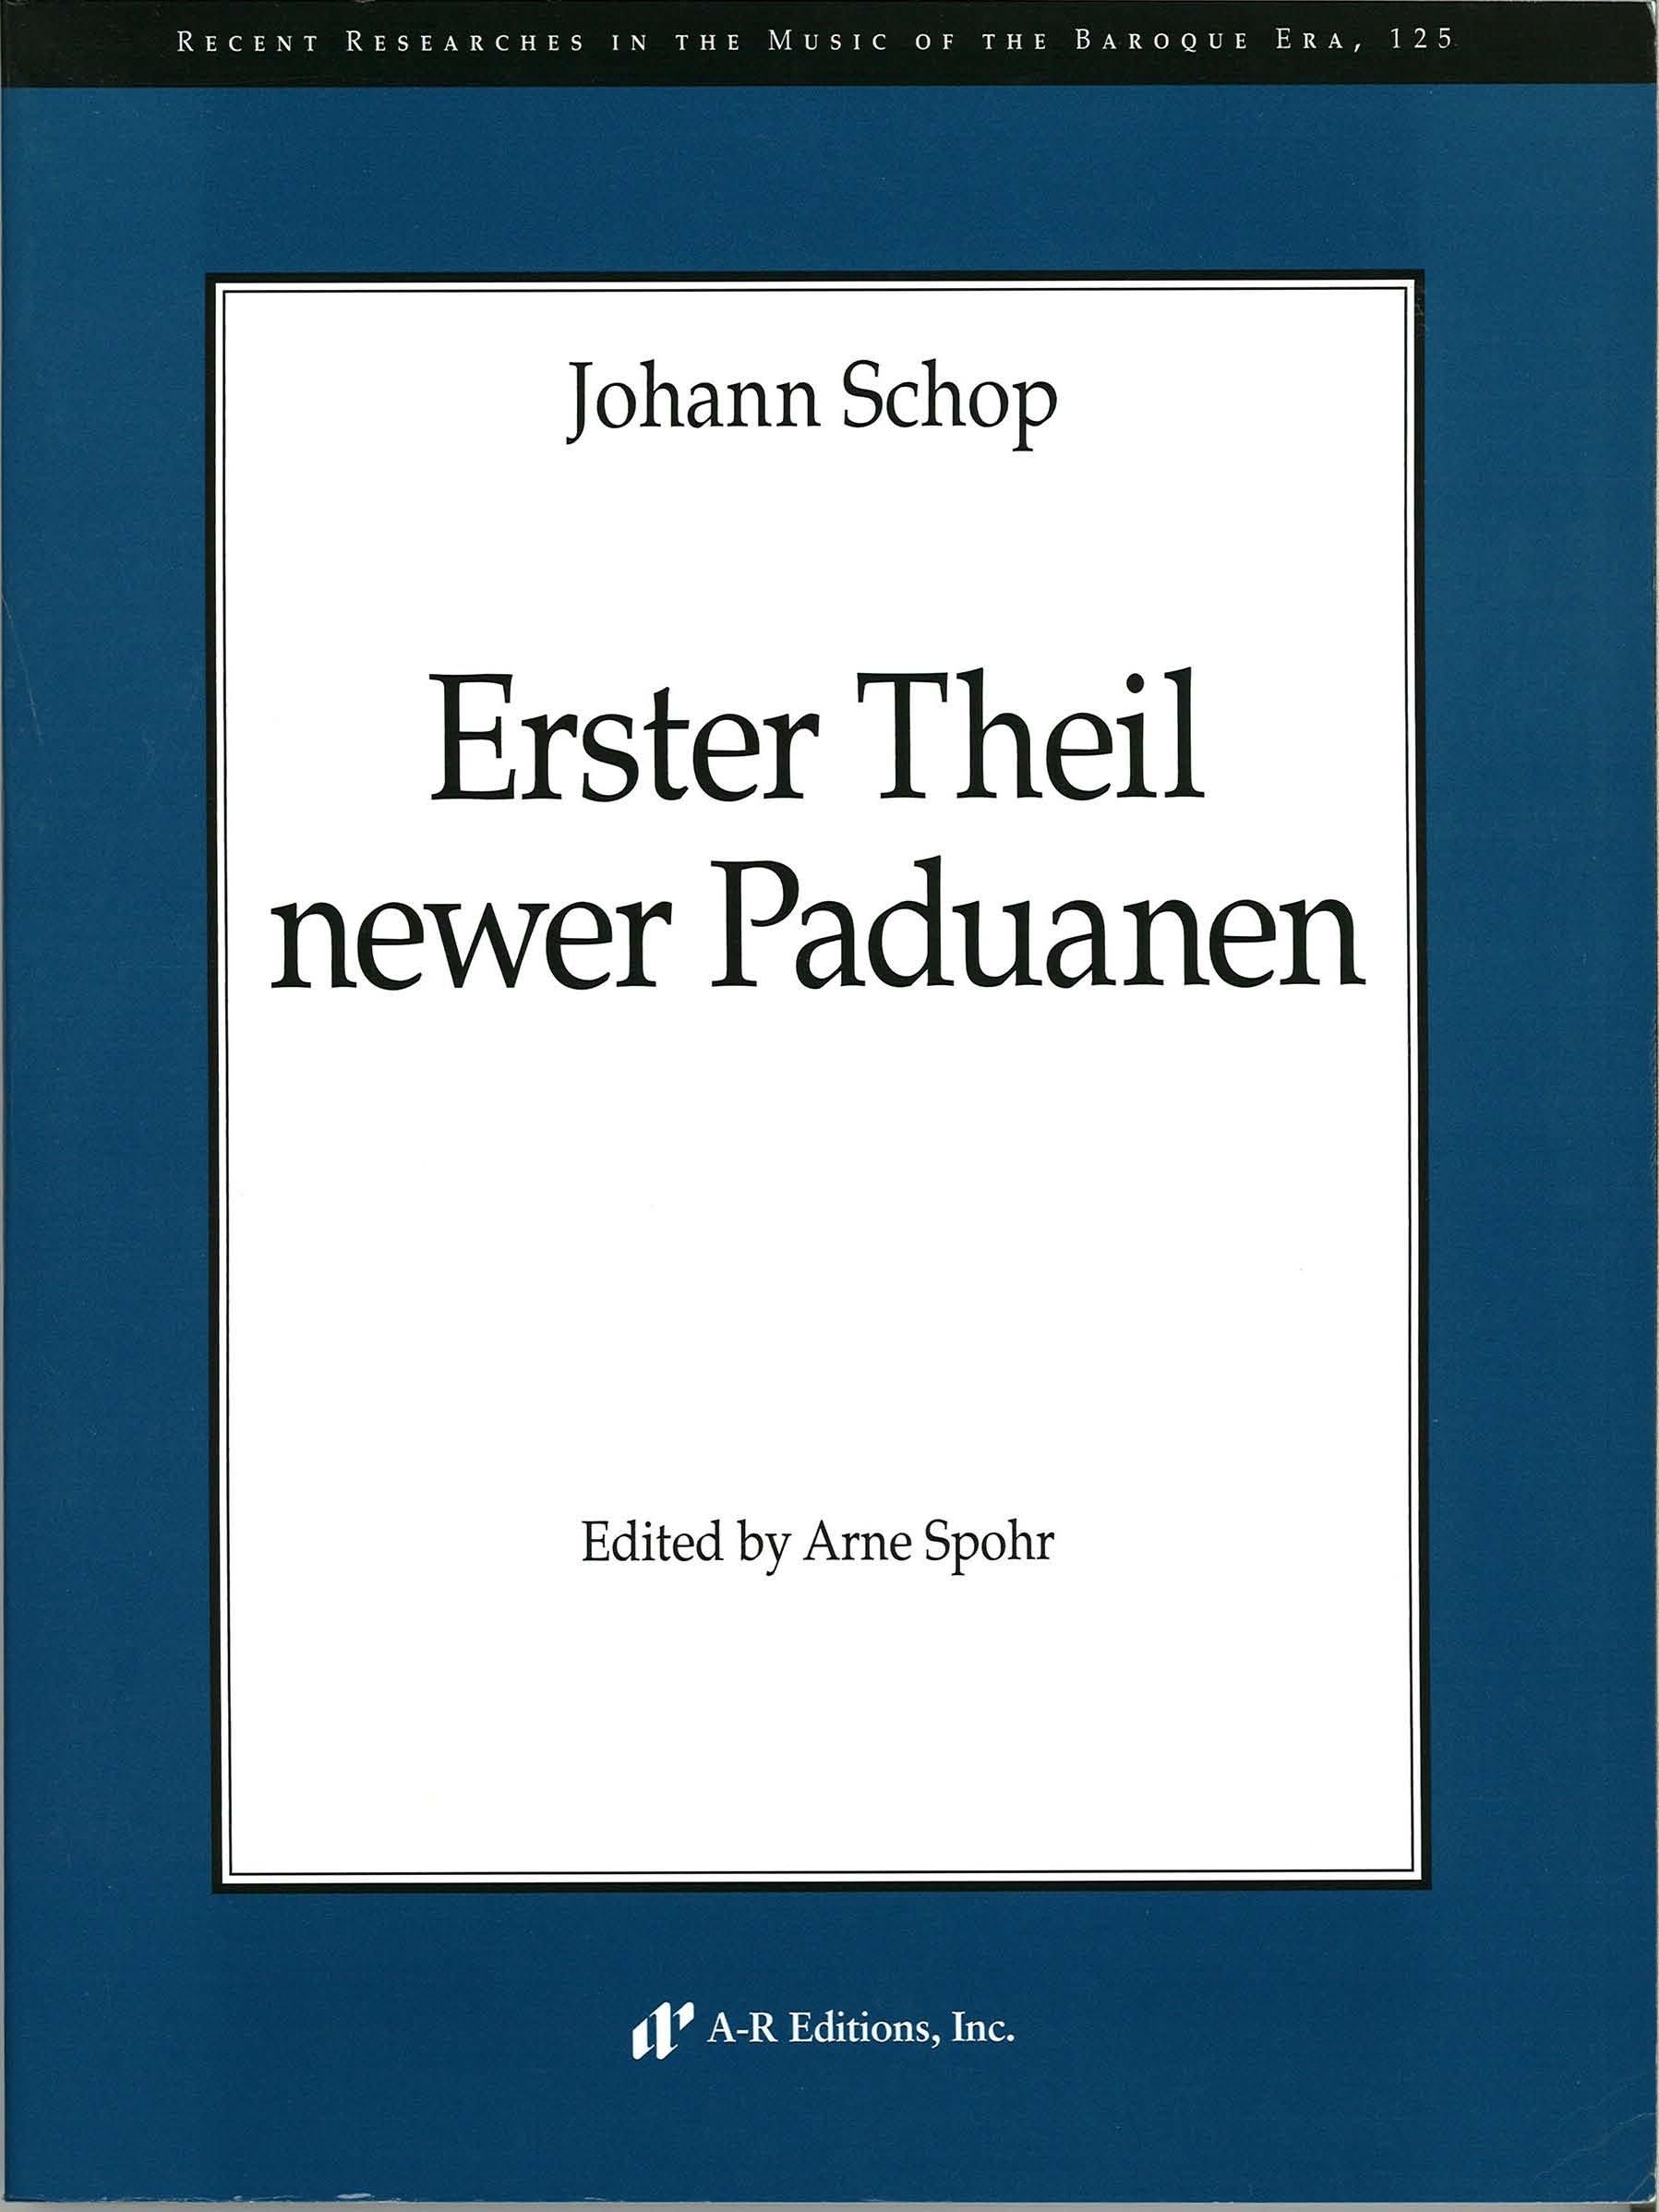 Download Baroque 125, Johann (ca. 1590-1667) Schop: Erster Theil newer Paduanen pdf epub